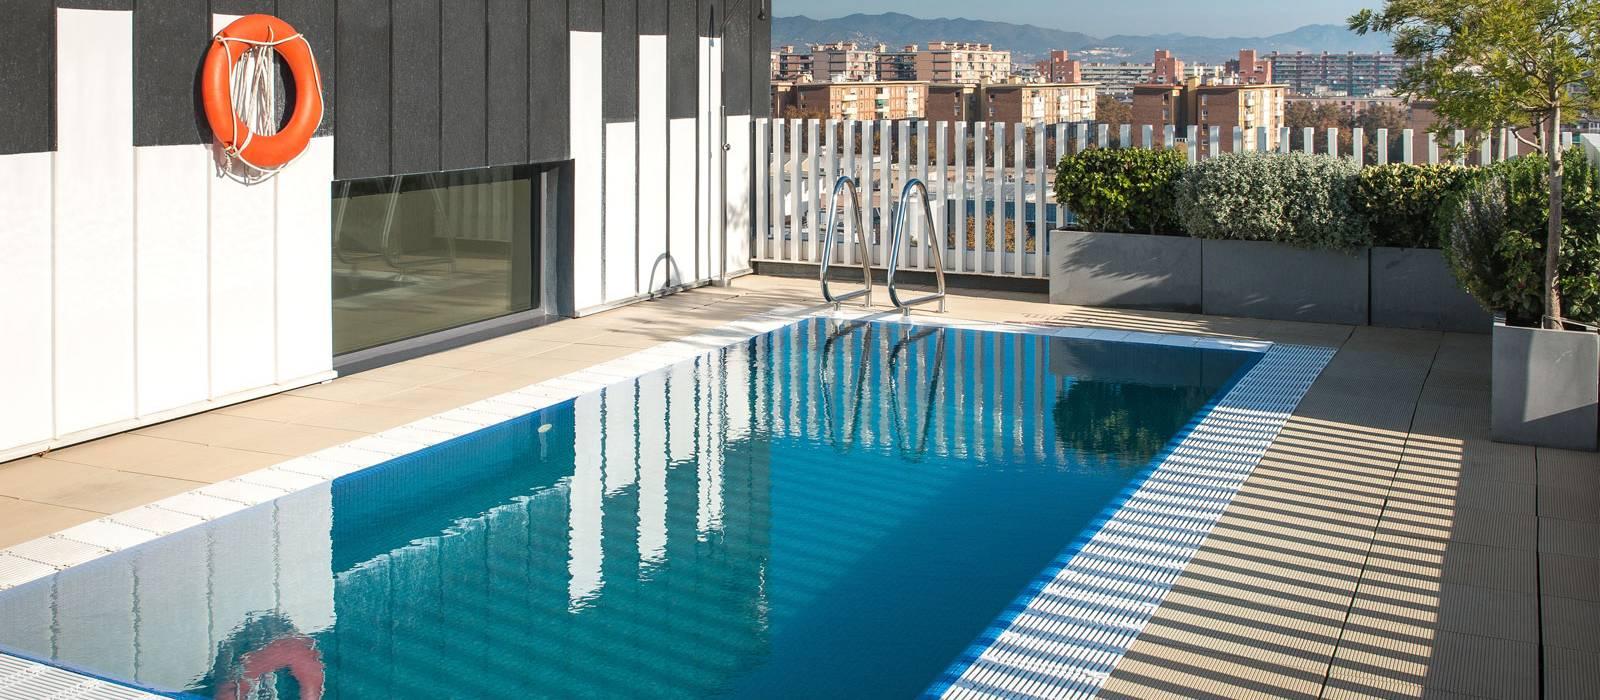 Servizi hotel barcelona bit vincci hoteles - Hoteles vincci barcelona ...